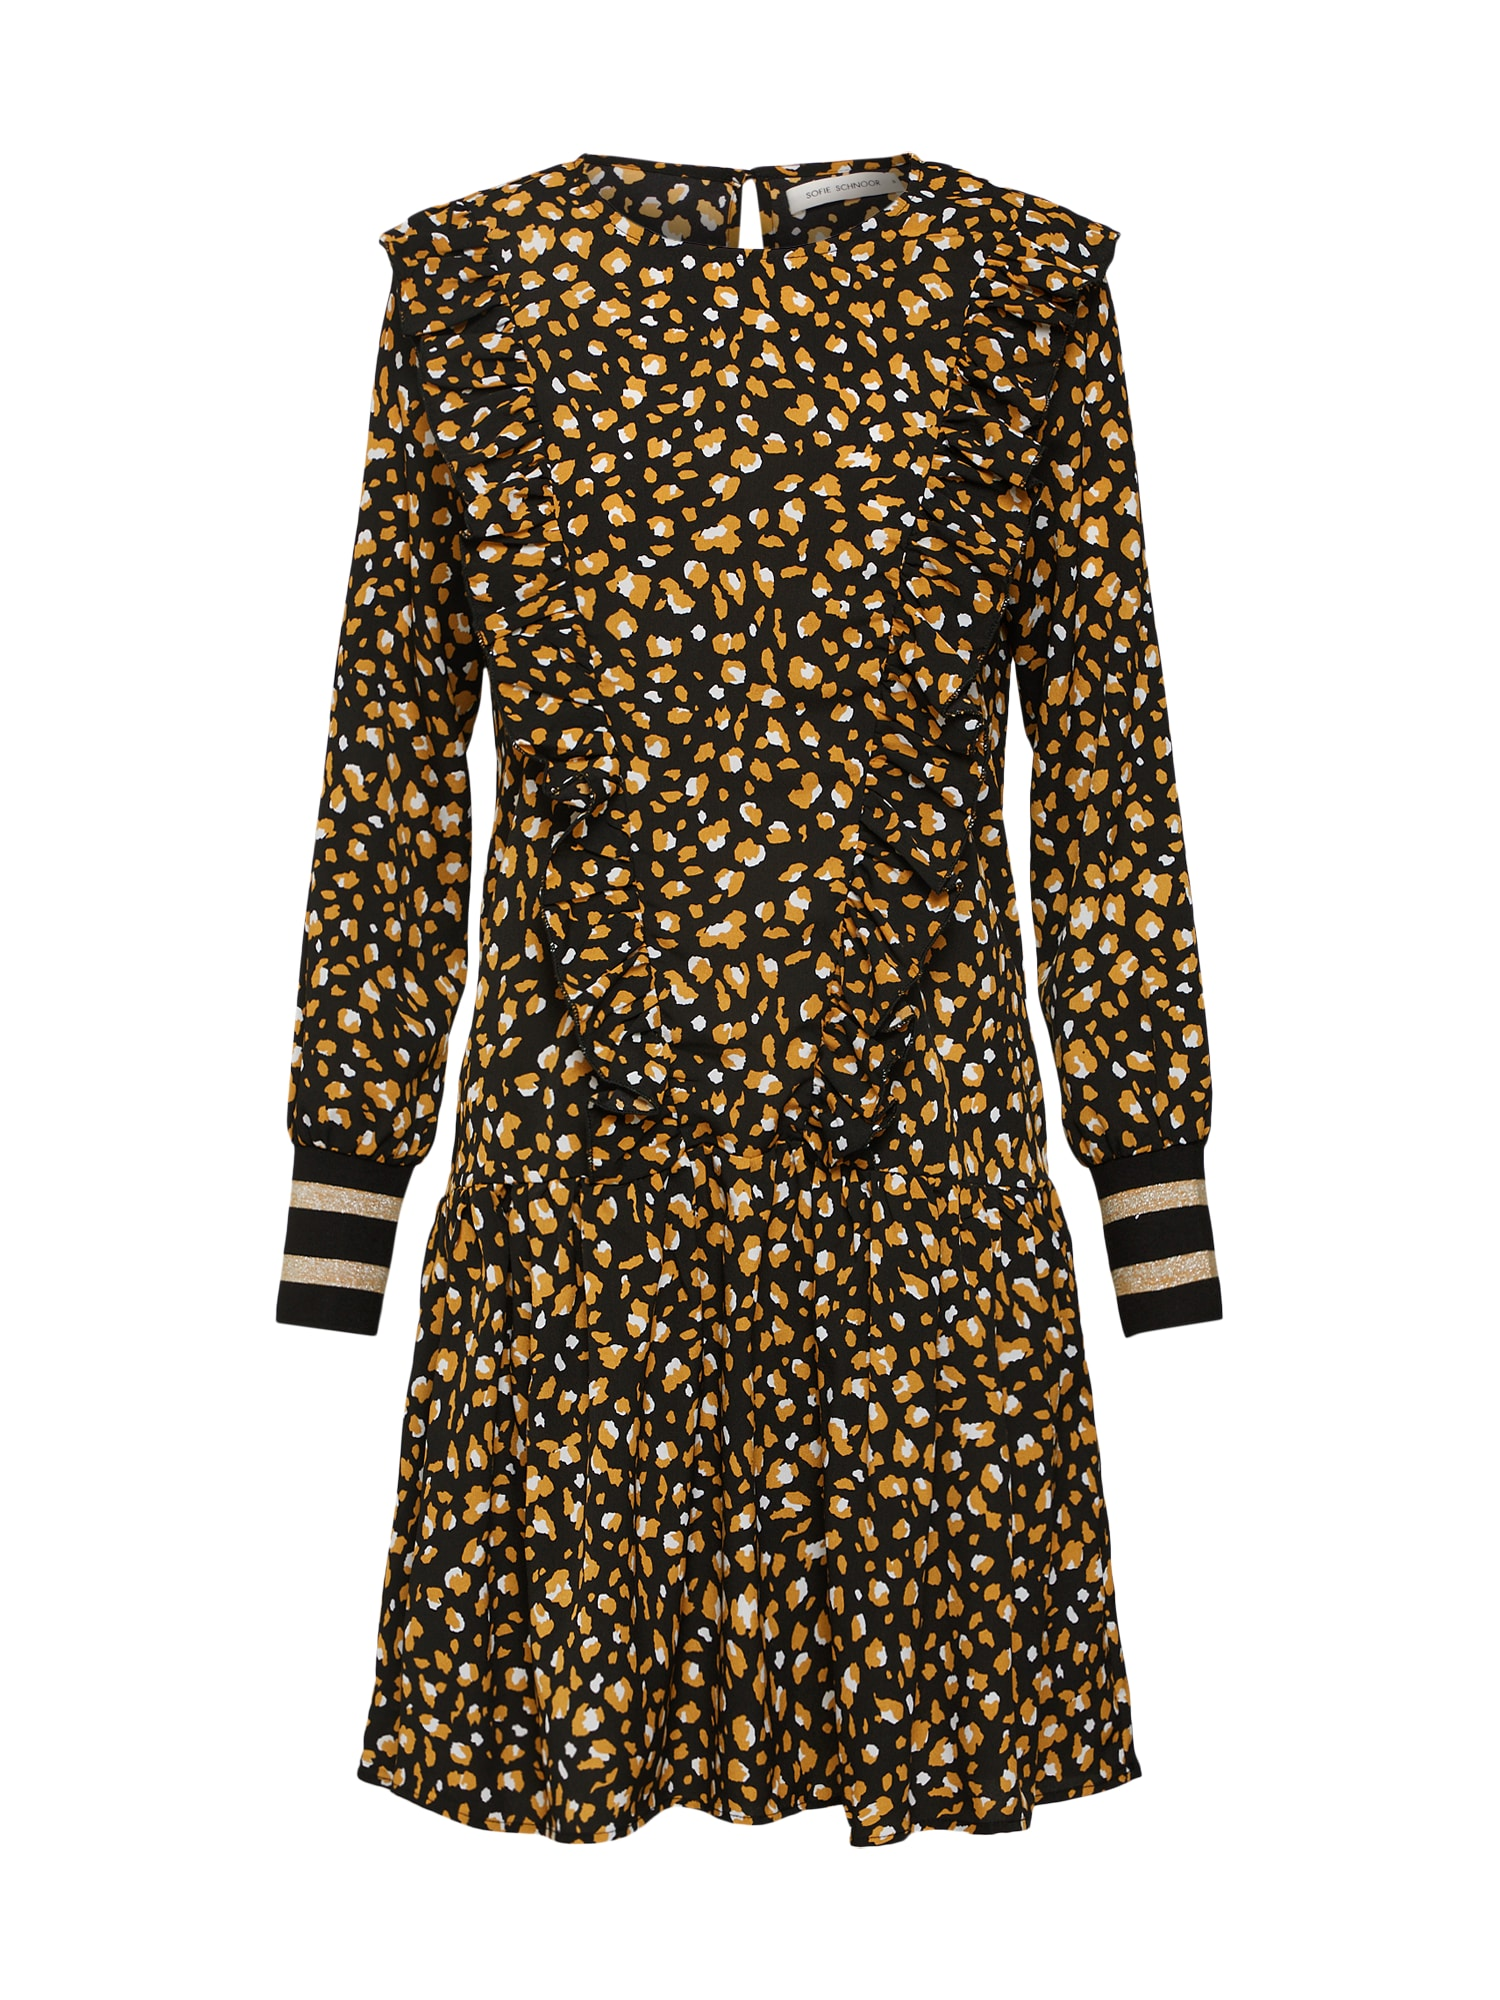 Šaty zlatě žlutá černá Sofie Schnoor